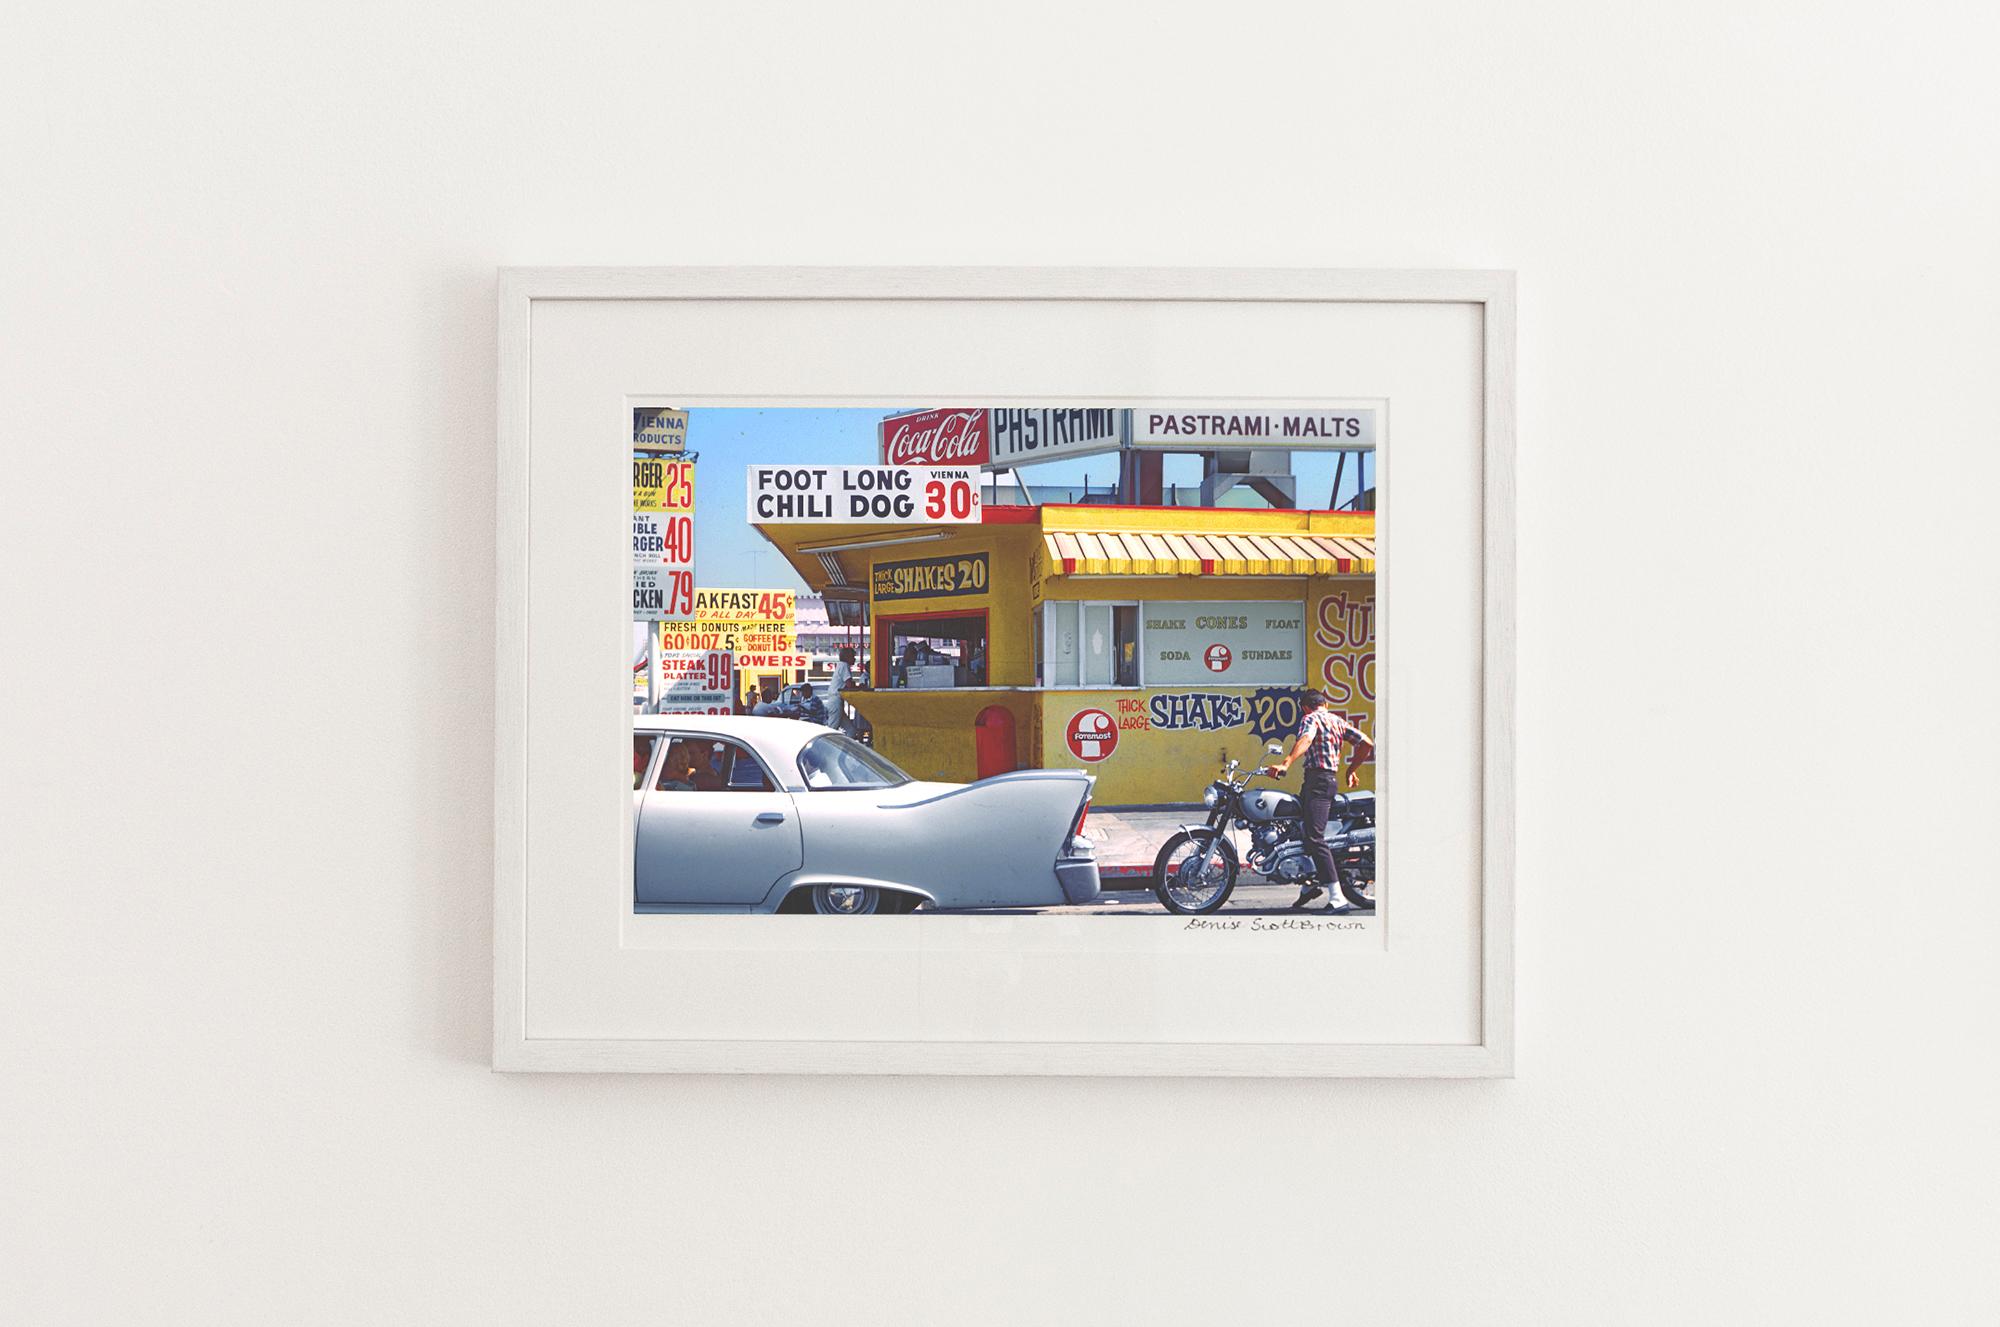 Pico Boulevard, Santa Monica ,1966. Giclée pigment on Hahnemuhle archival paper, 45.5 x 30.3 cm (framed), Edition of 10